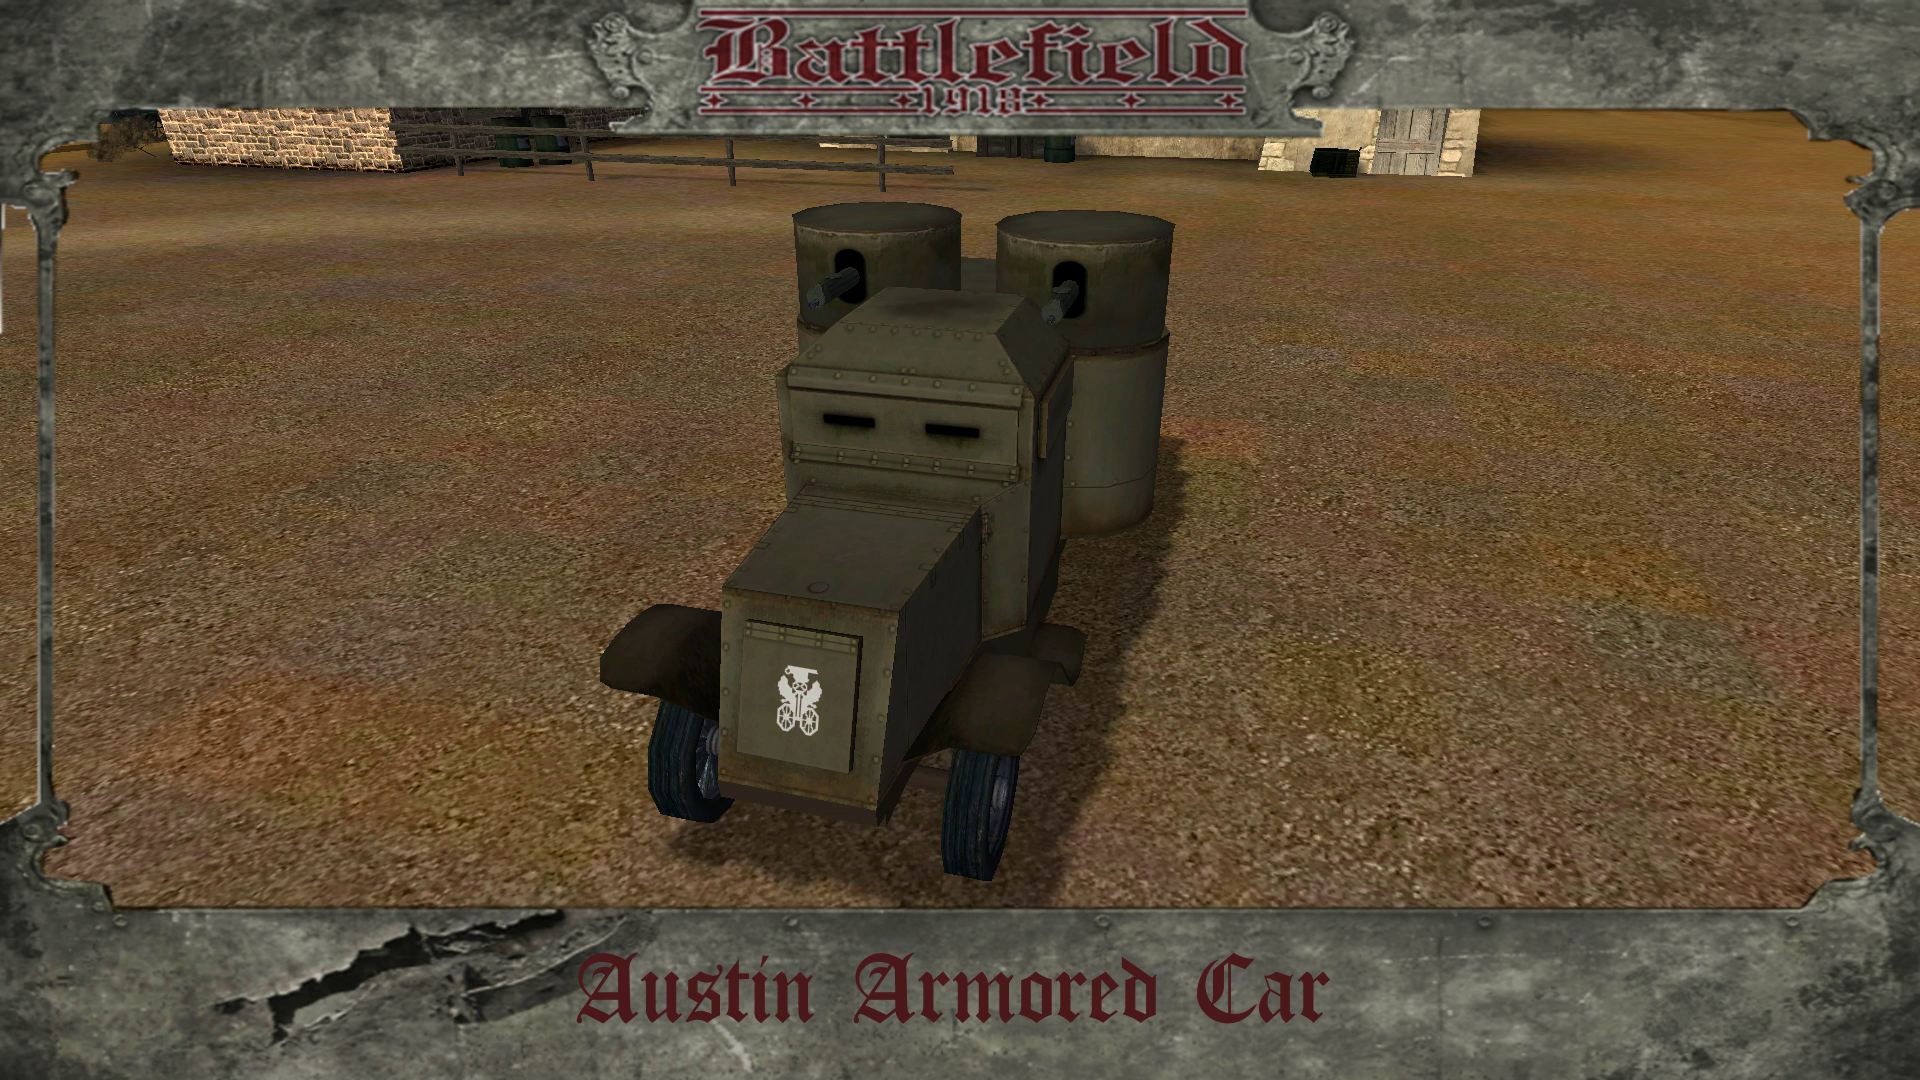 Austin Armored Car